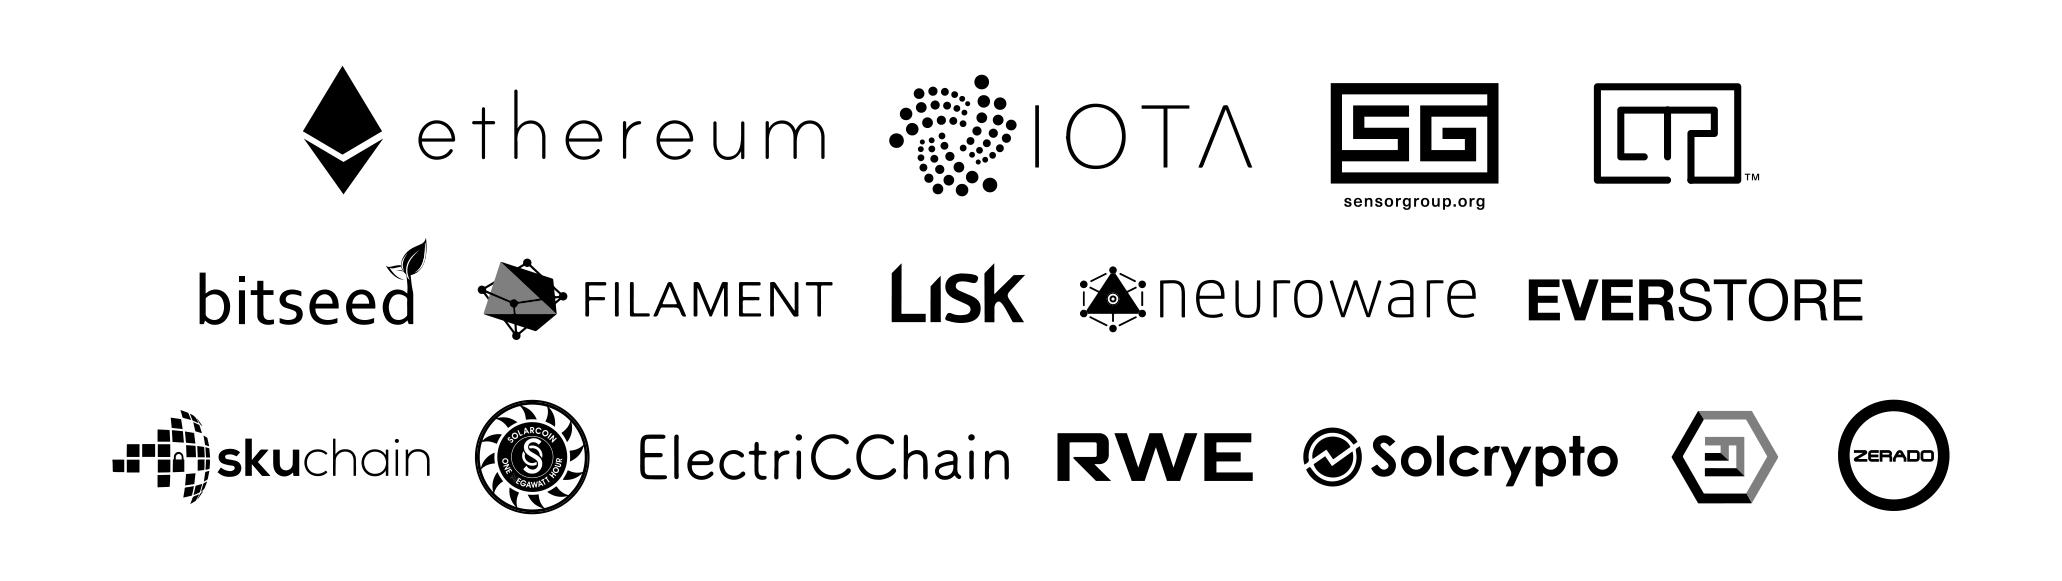 BIOT Partners